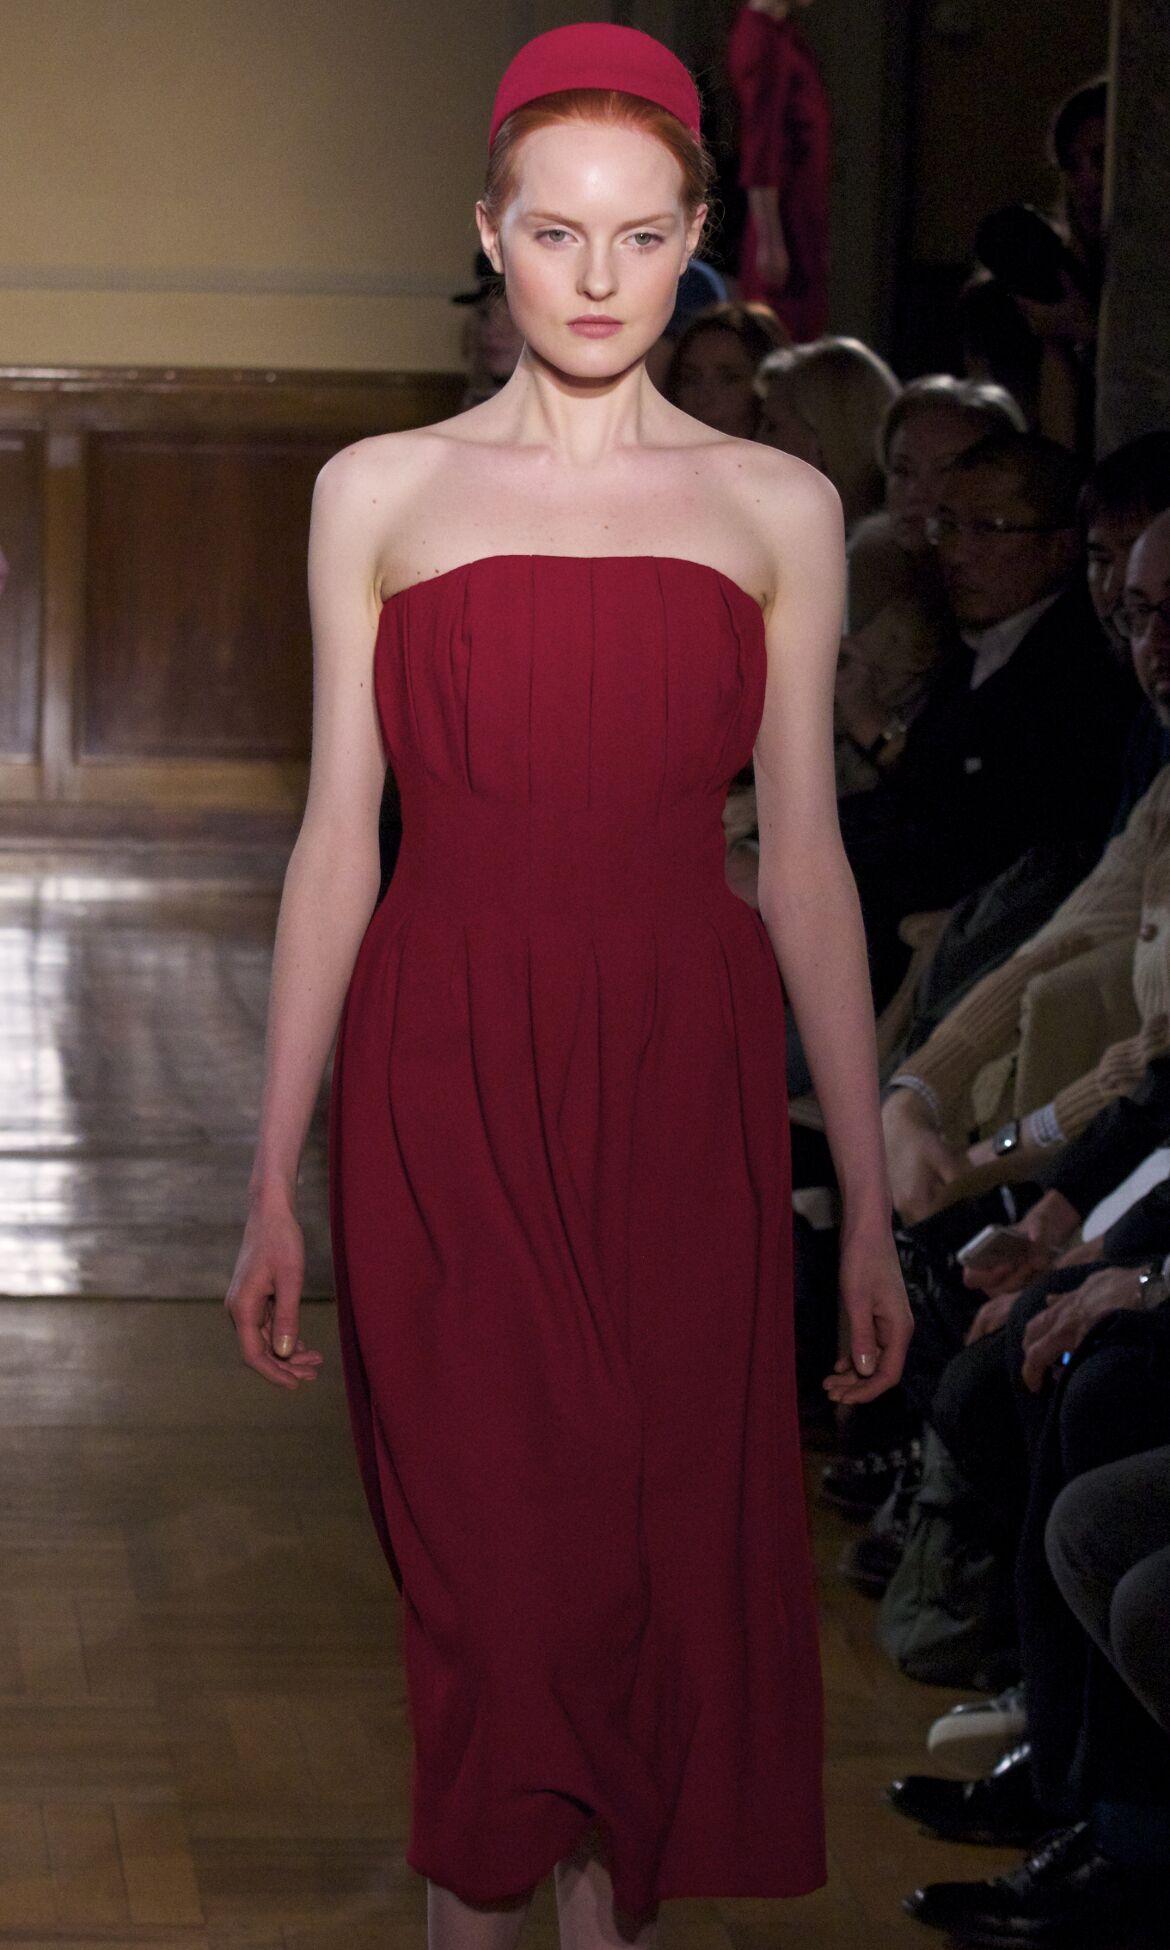 Andrea Incontri Fashion Show 2013 Milan Fashion Week